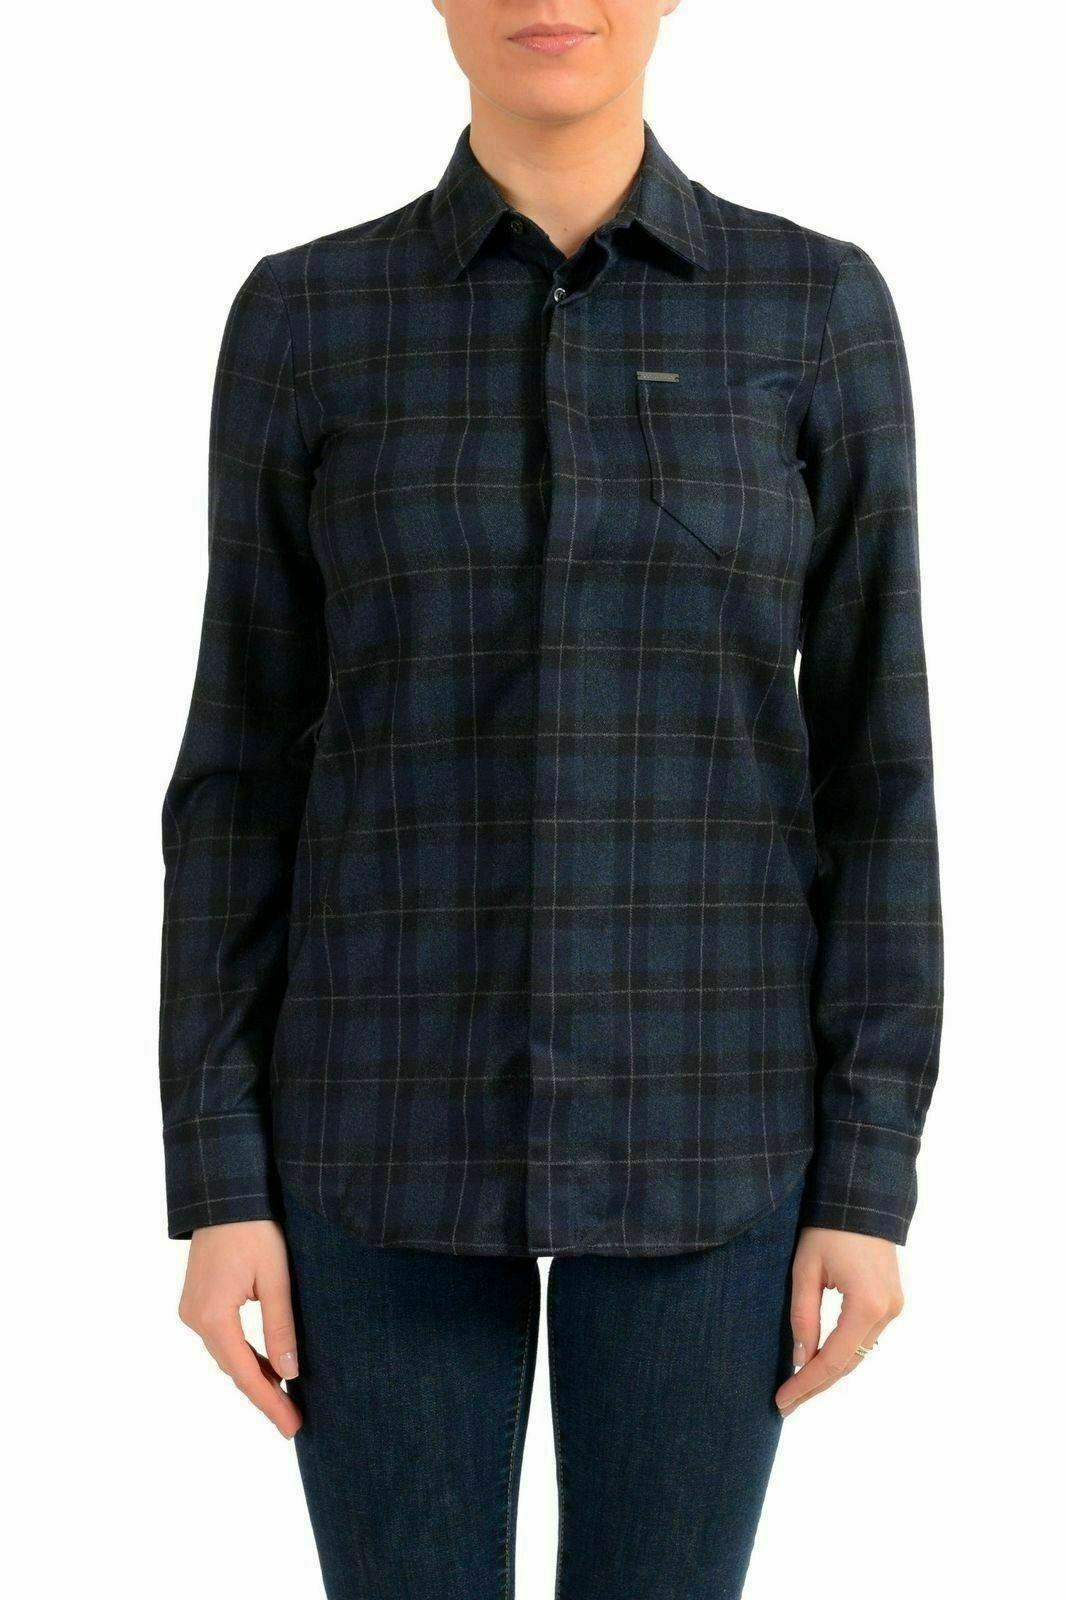 Dsquarot2 Woherren 100% Wool Plaid Long Sleeve Button Down Shirt US XS IT 38